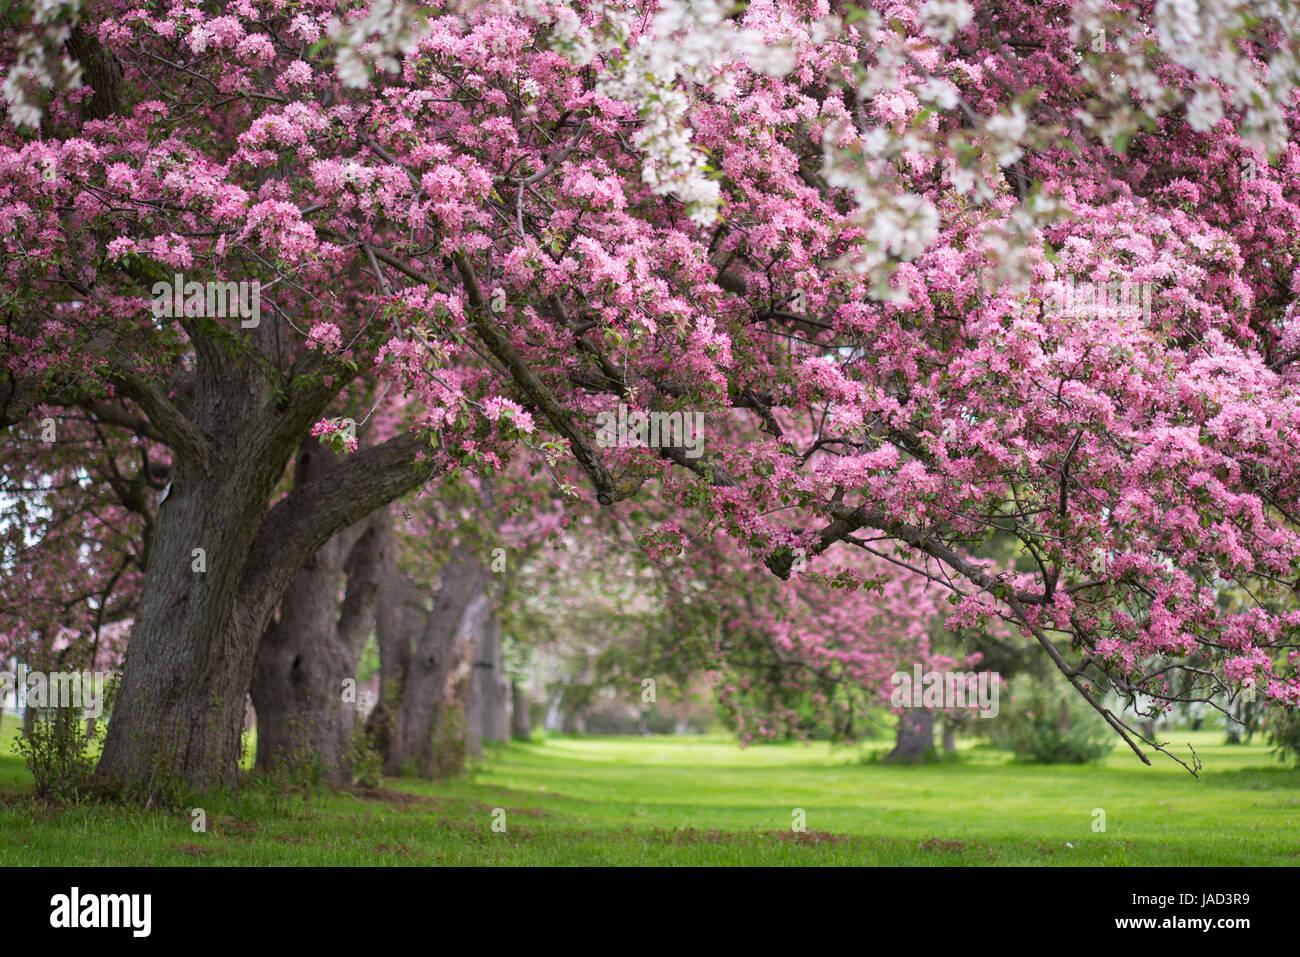 Pink and white flowering trees in ottawa stock photo 144117885 alamy pink and white flowering trees in ottawa mightylinksfo